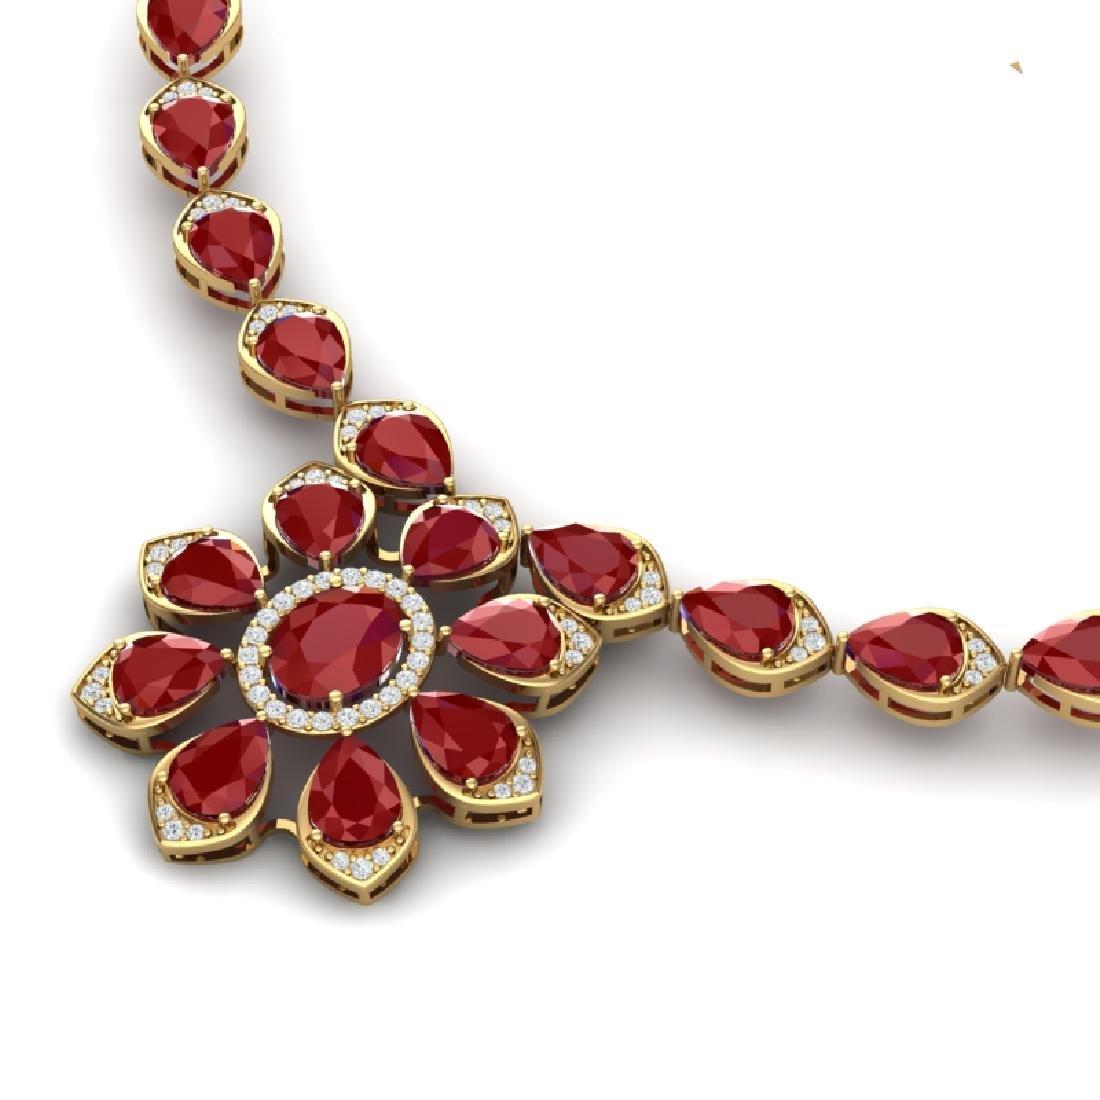 30.70 CTW Royalty Ruby & VS Diamond Necklace 18K Yellow - 2